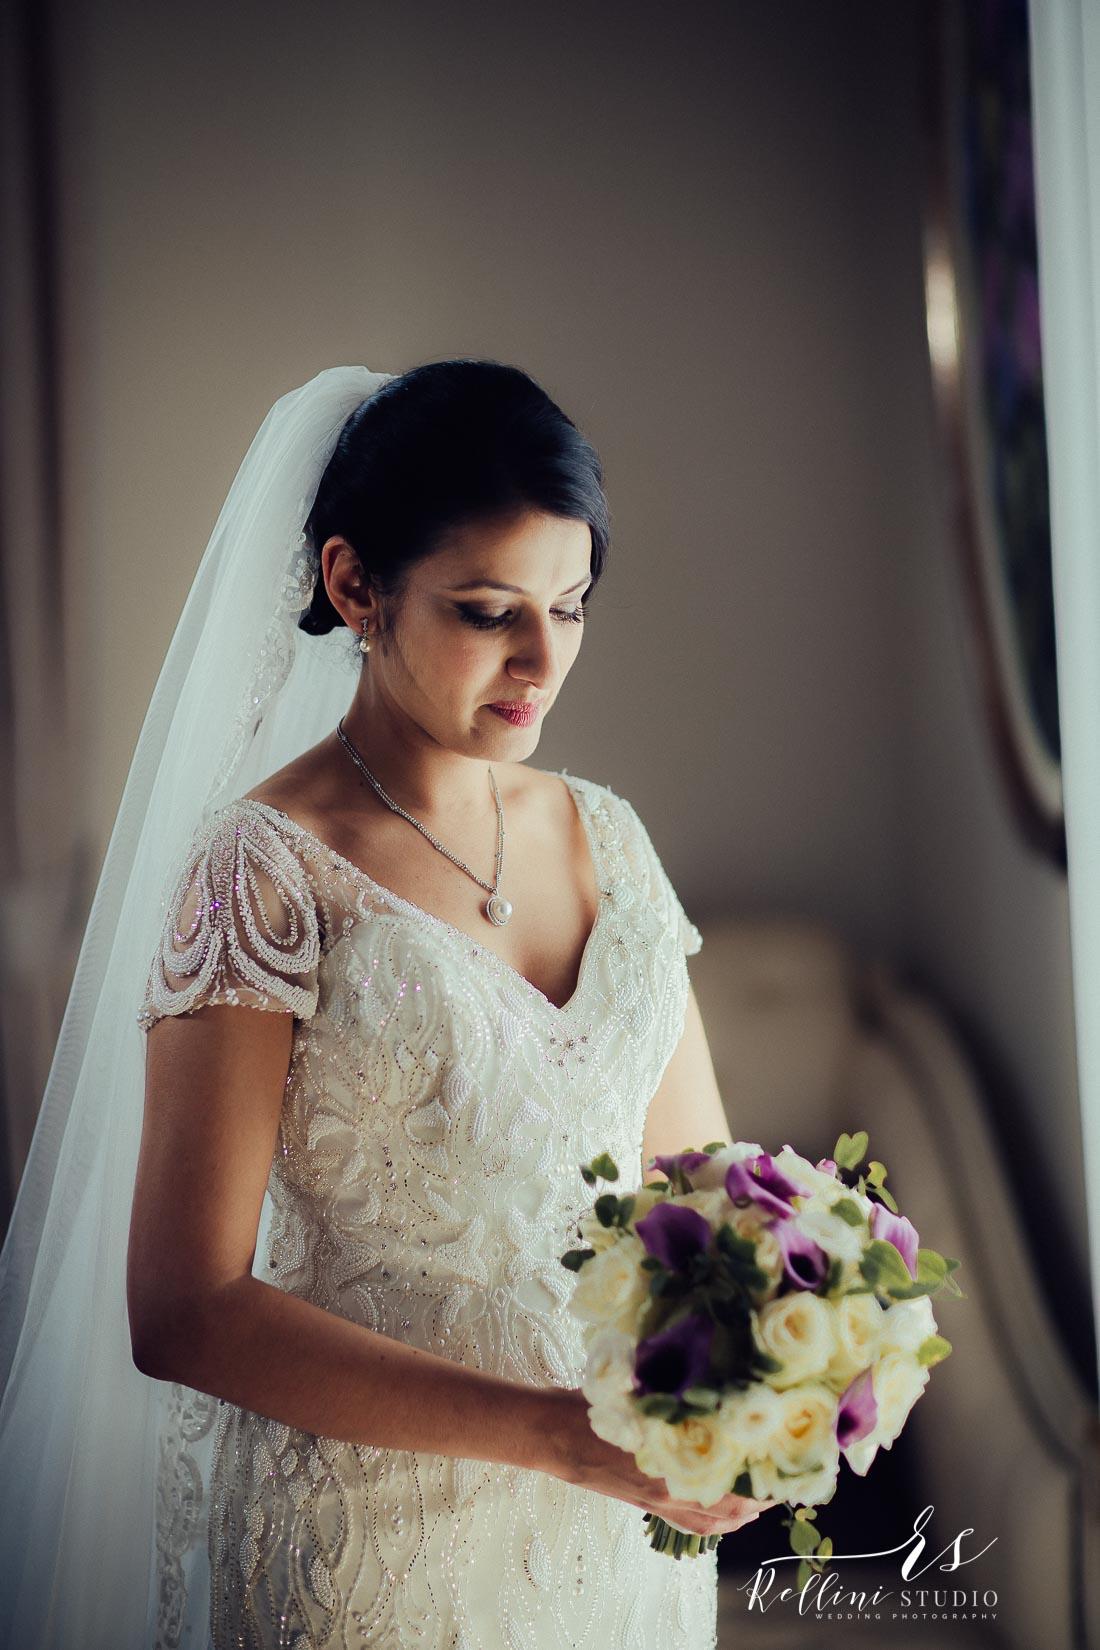 wedding at Villa Corsini a Mezzomonte in Florence, Rellini art studio wedding photographers